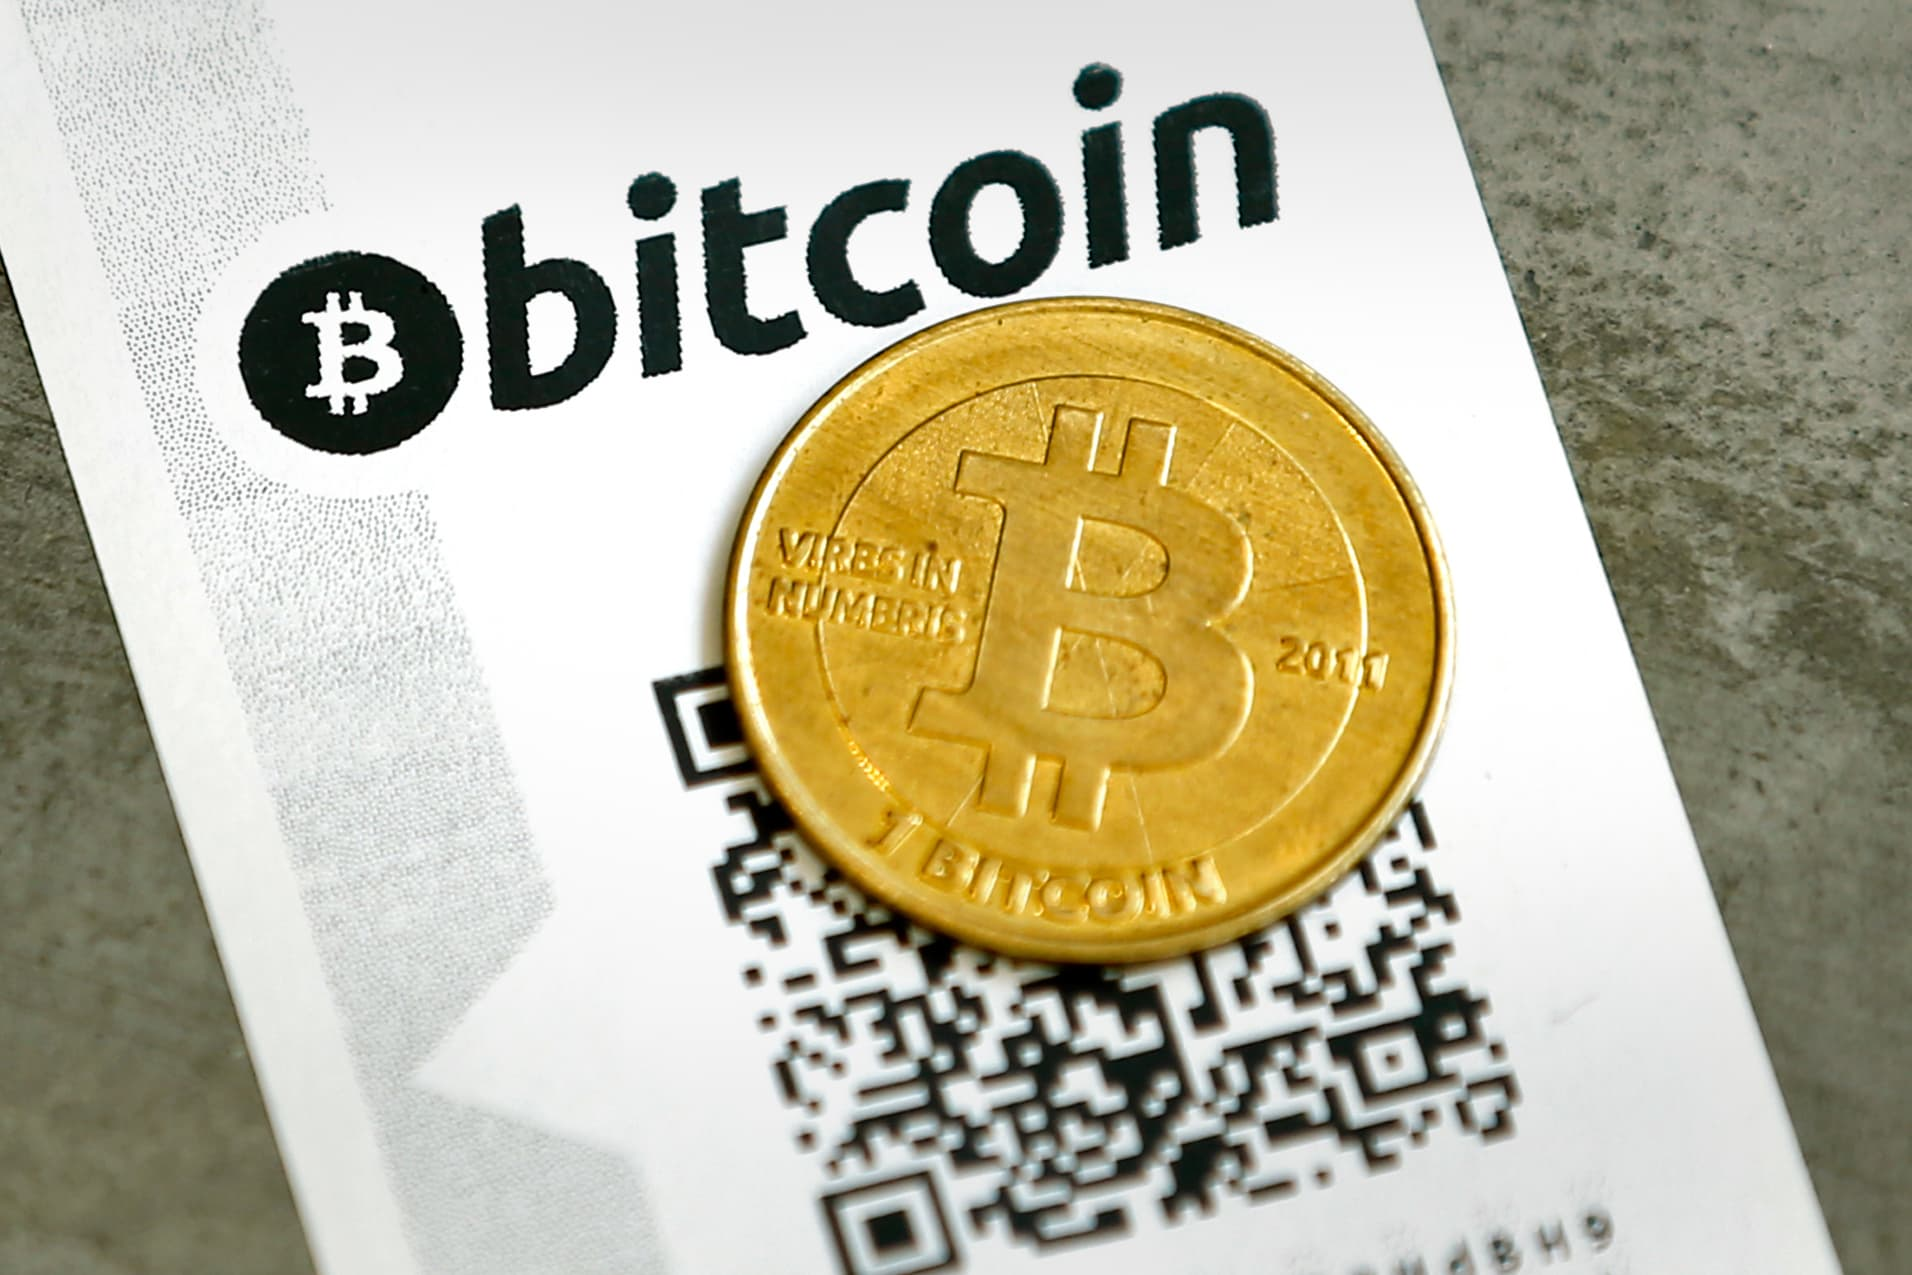 Bitcoin-friendly company Revolut launches first non-financial service